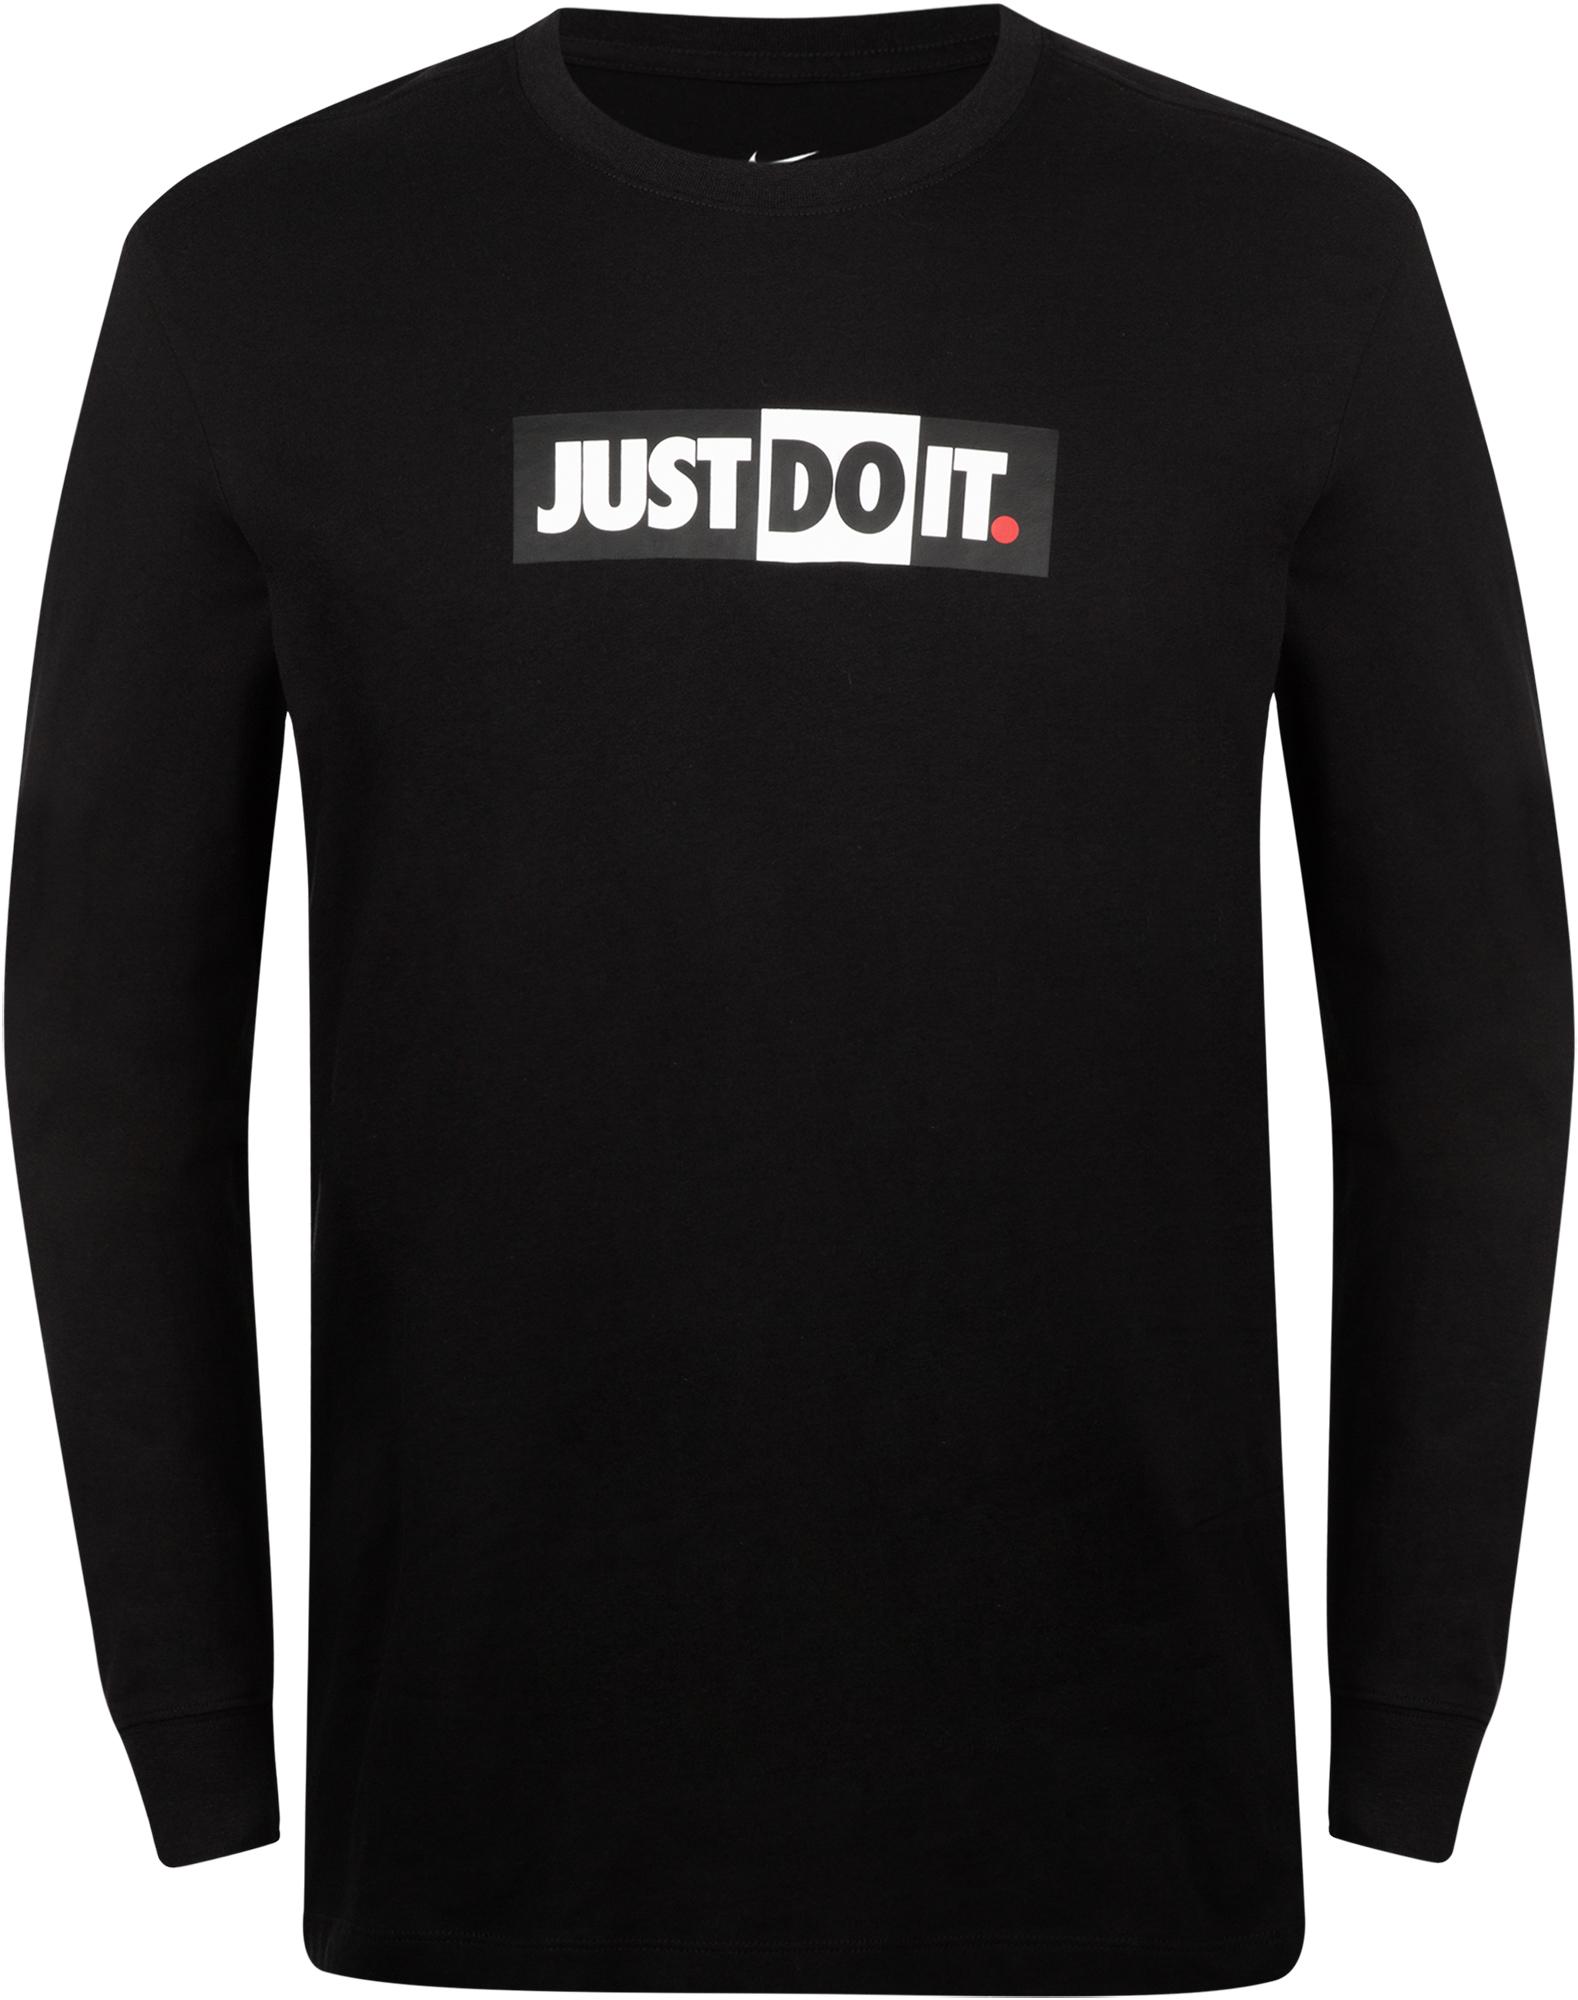 Фото - Nike Свитшот мужской Nike Sportswear JDI, размер 50-52 nike свитшот мужской nike sportswear just do it размер 52 54